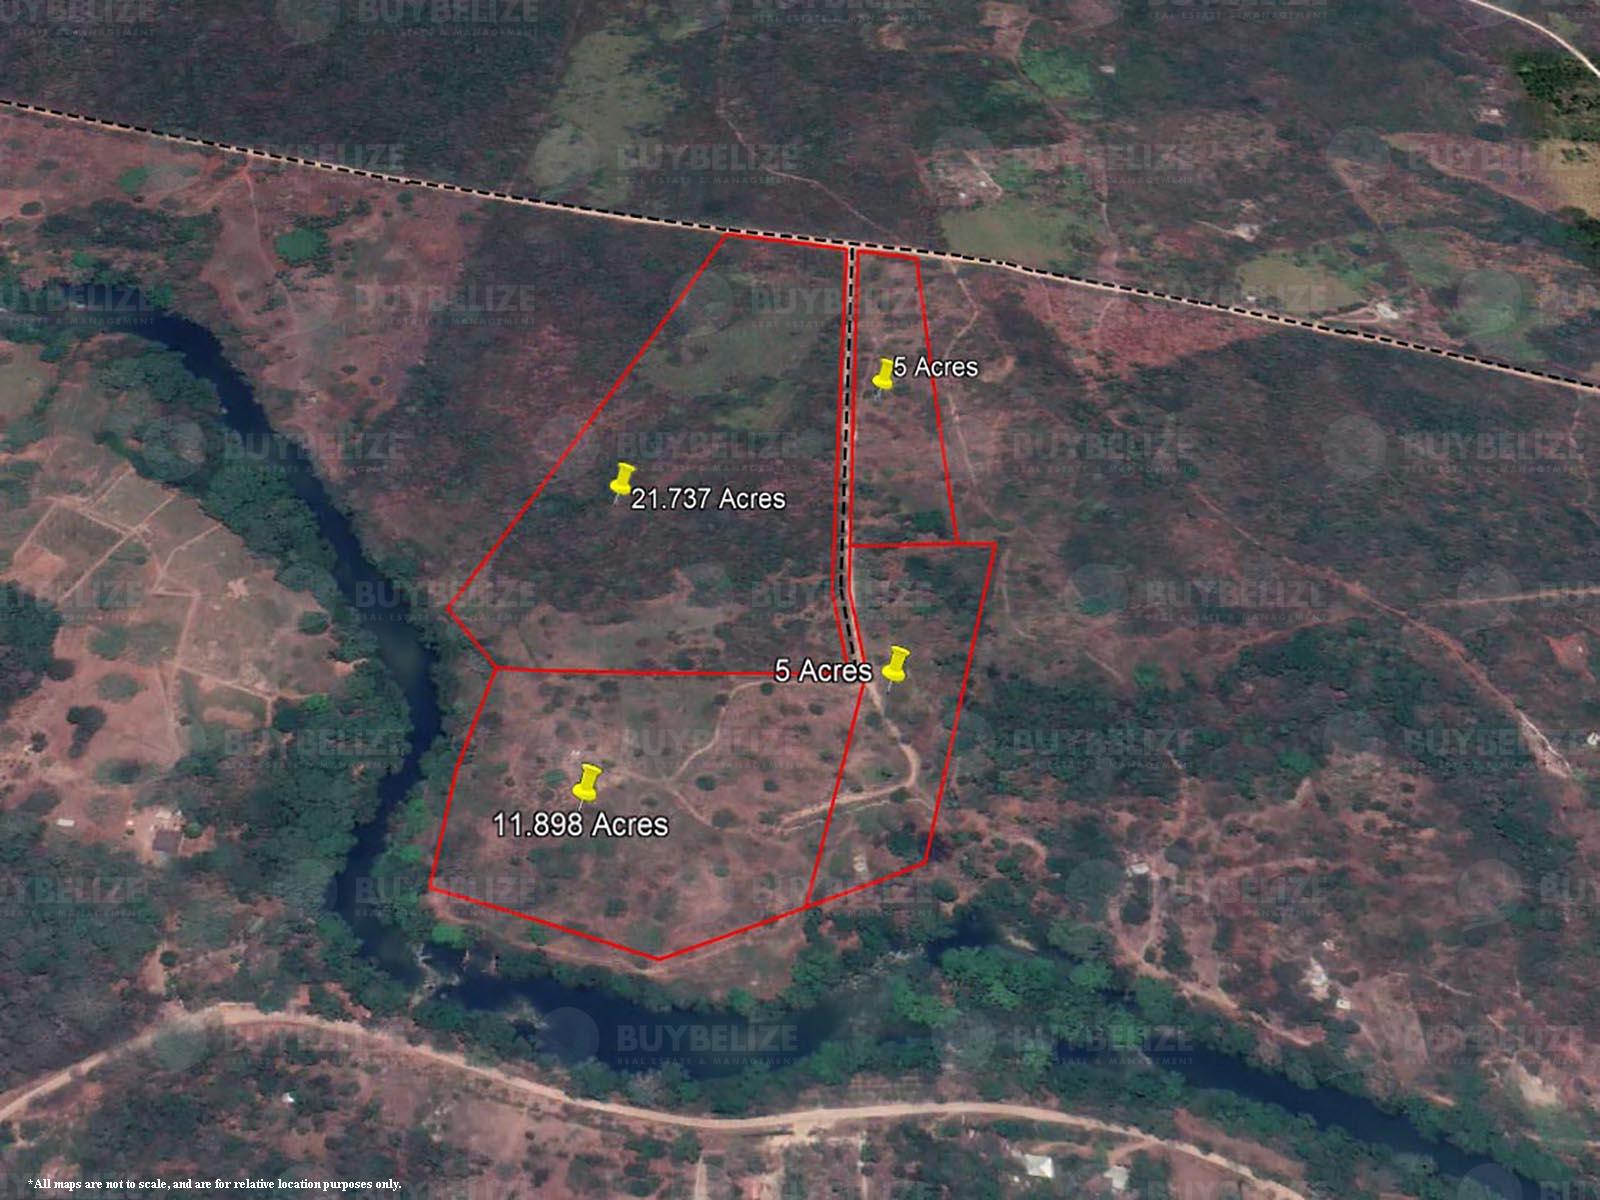 43 Acres of land in Bullet Tree